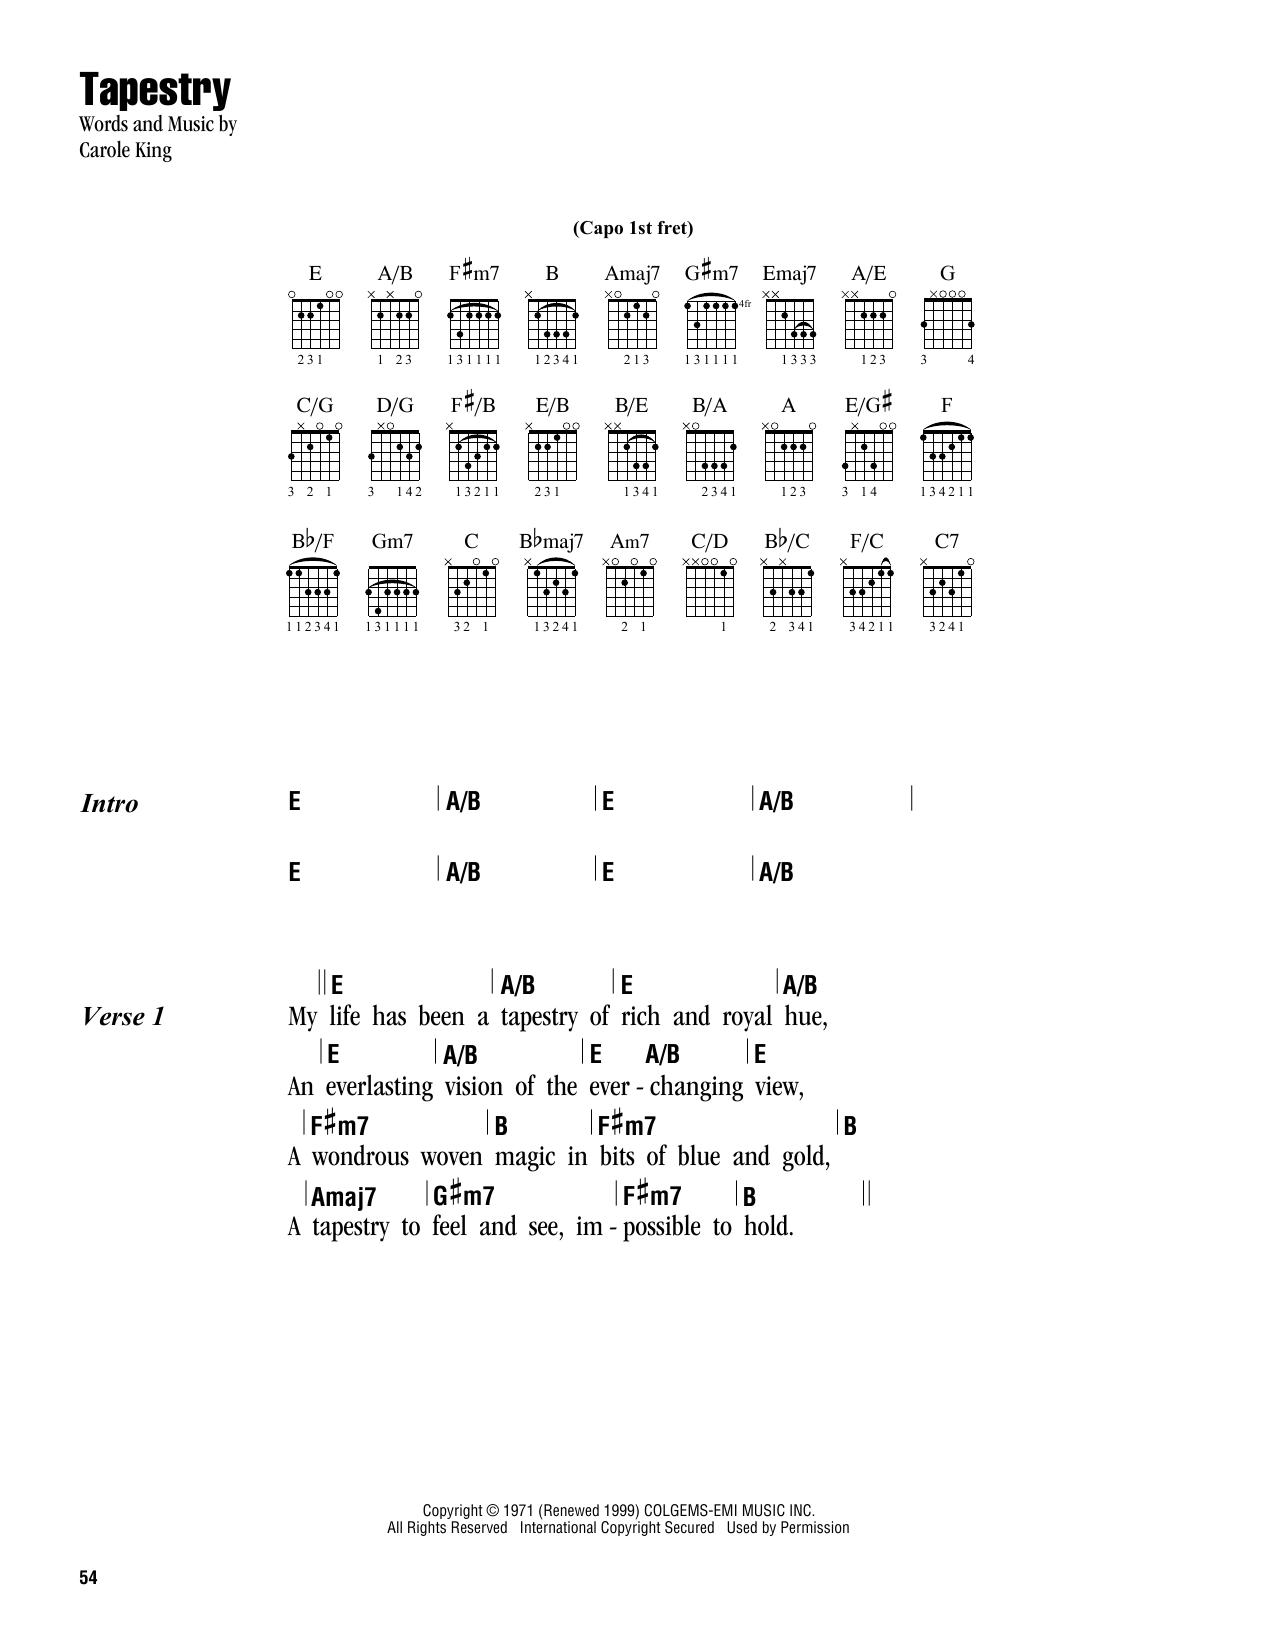 Carole King - Tapestry Lyrics and Tracklist | Genius